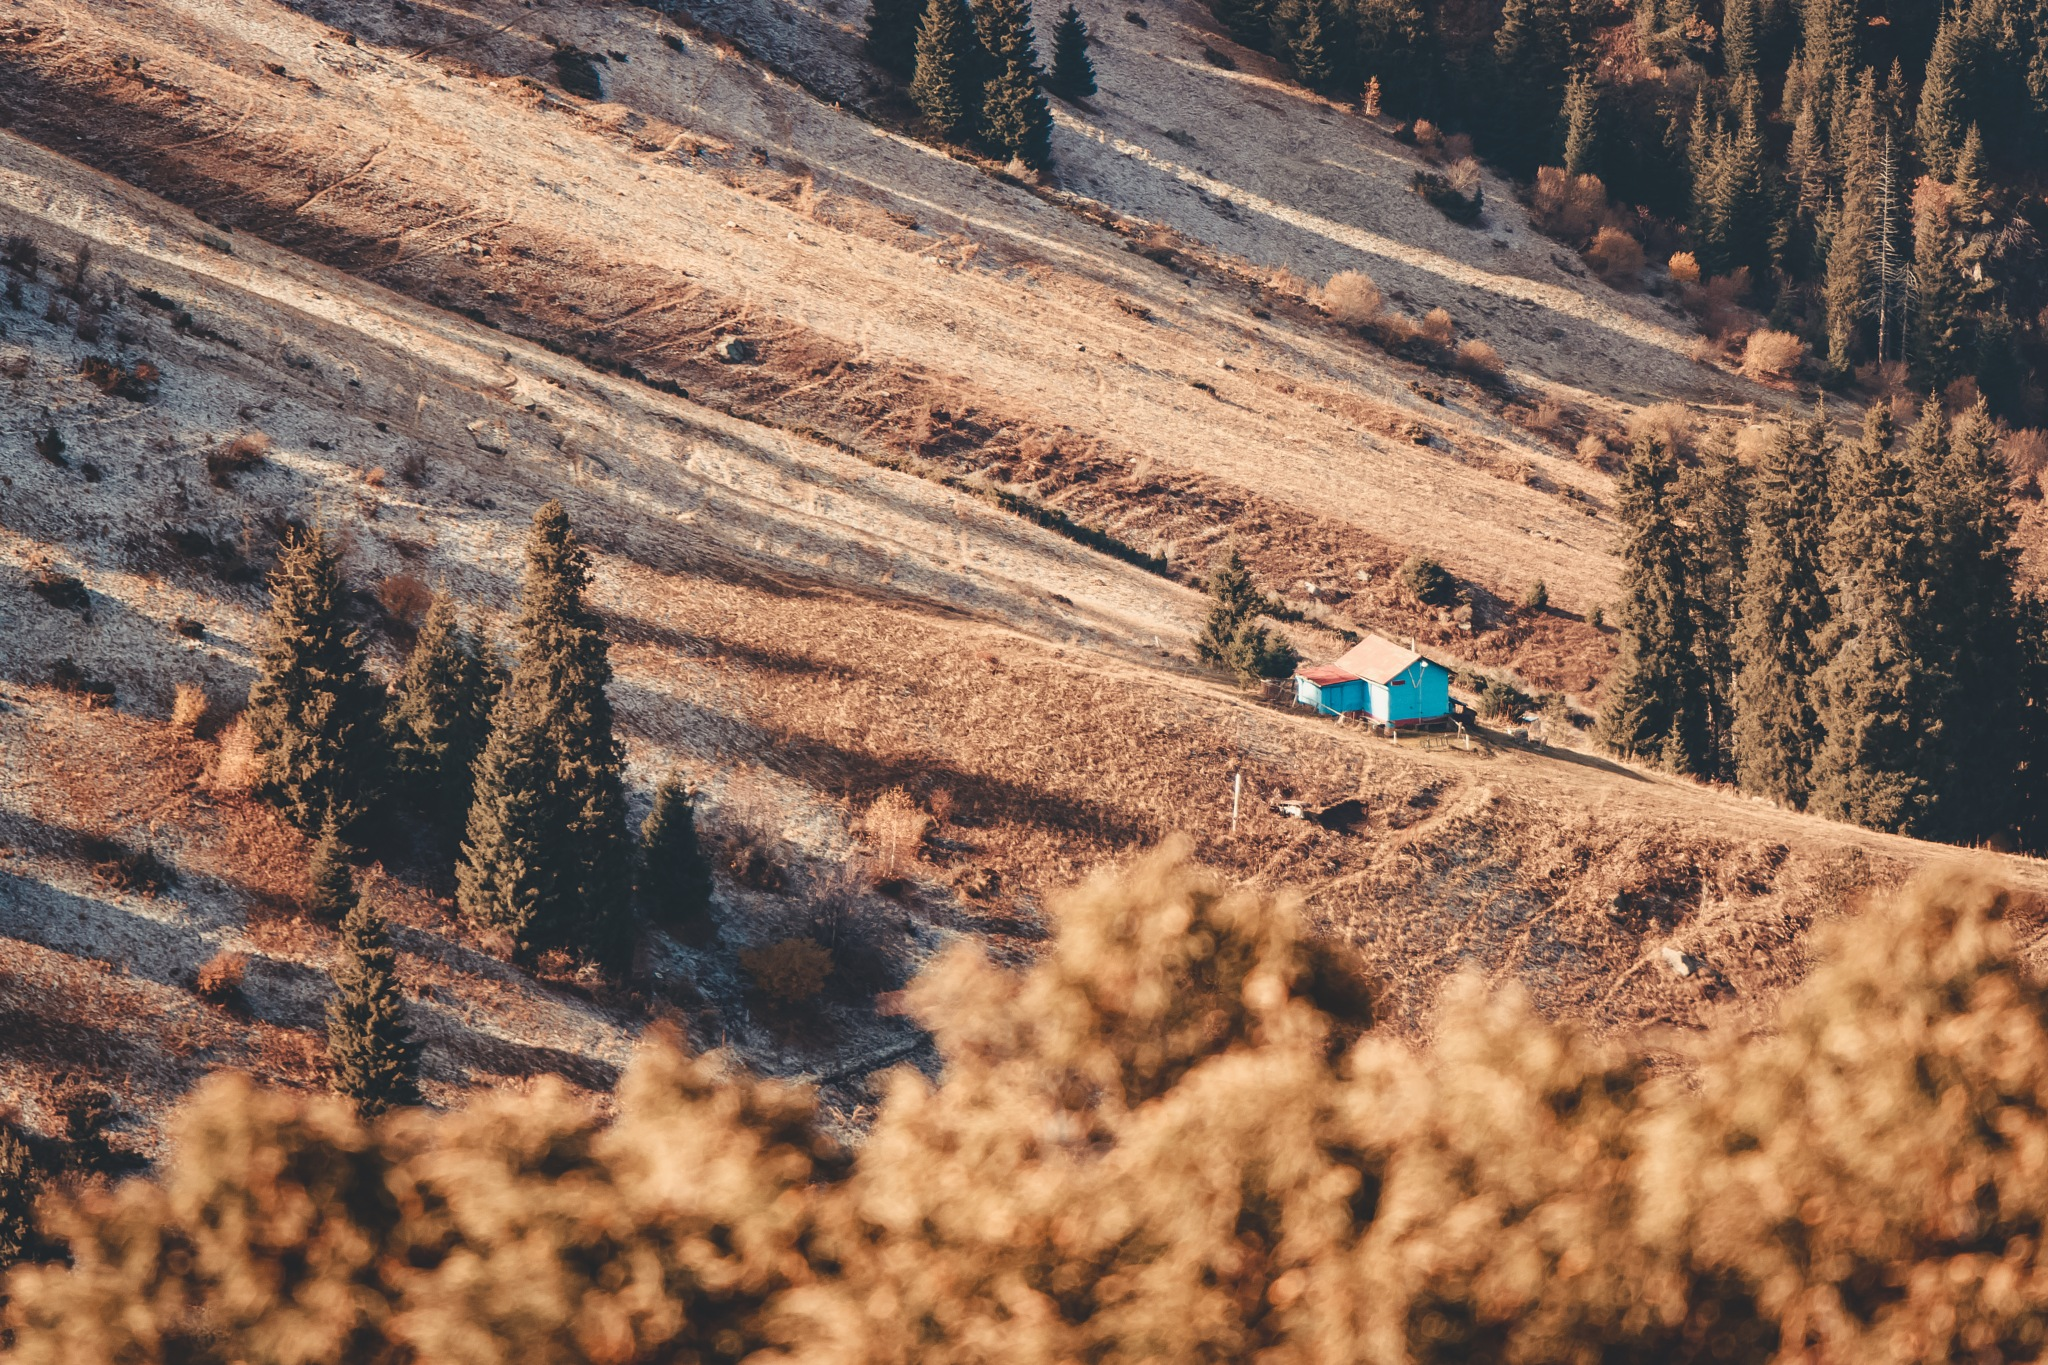 House on Top by Anton Pogoda